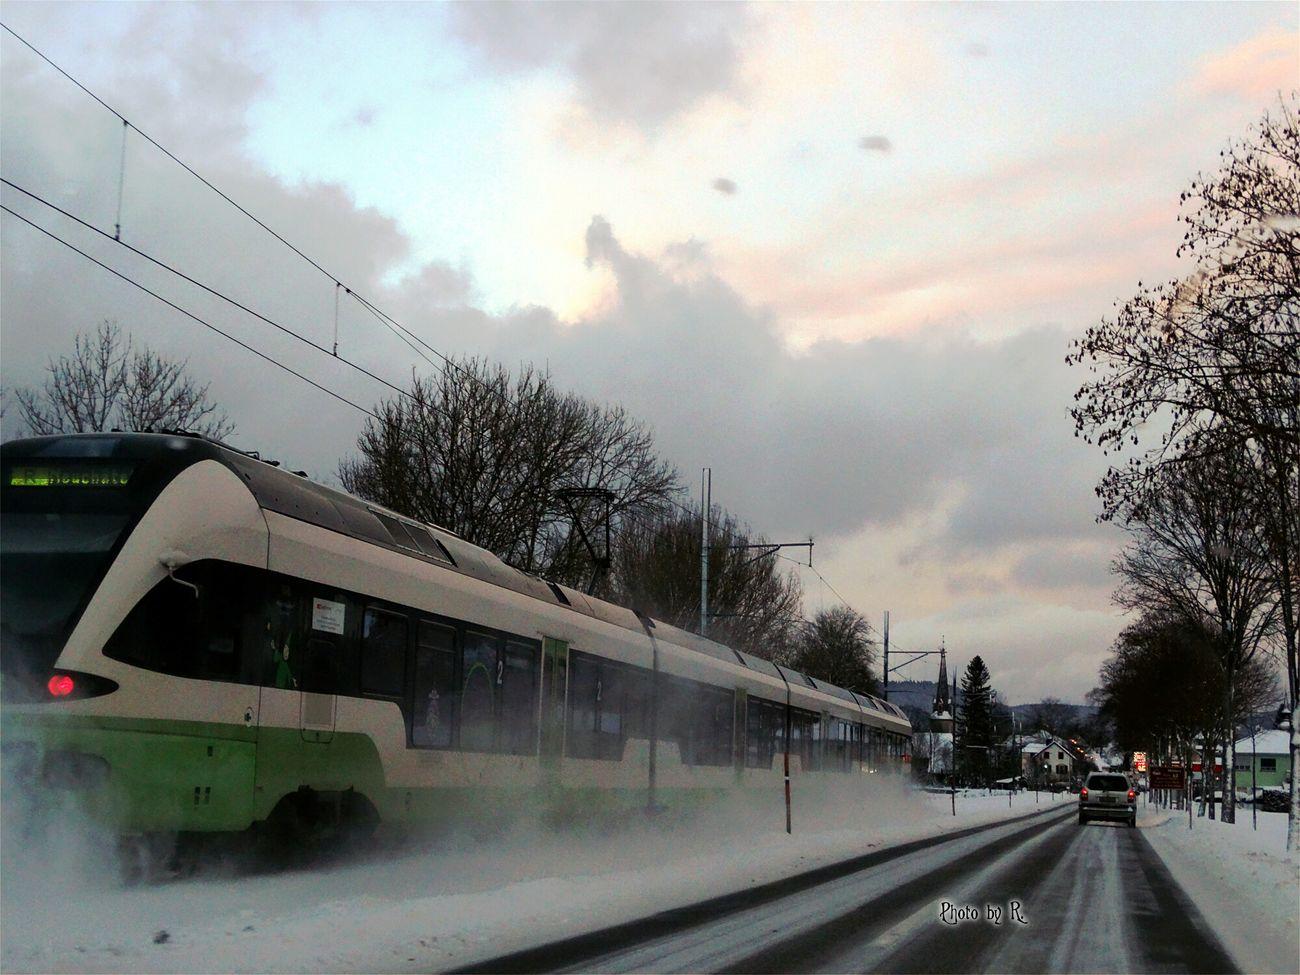 Train Tree Nature Outdoors Cloud - Sky Eyeem Best Shot EyeEm Best Shots Taking Photos Photography Landscape